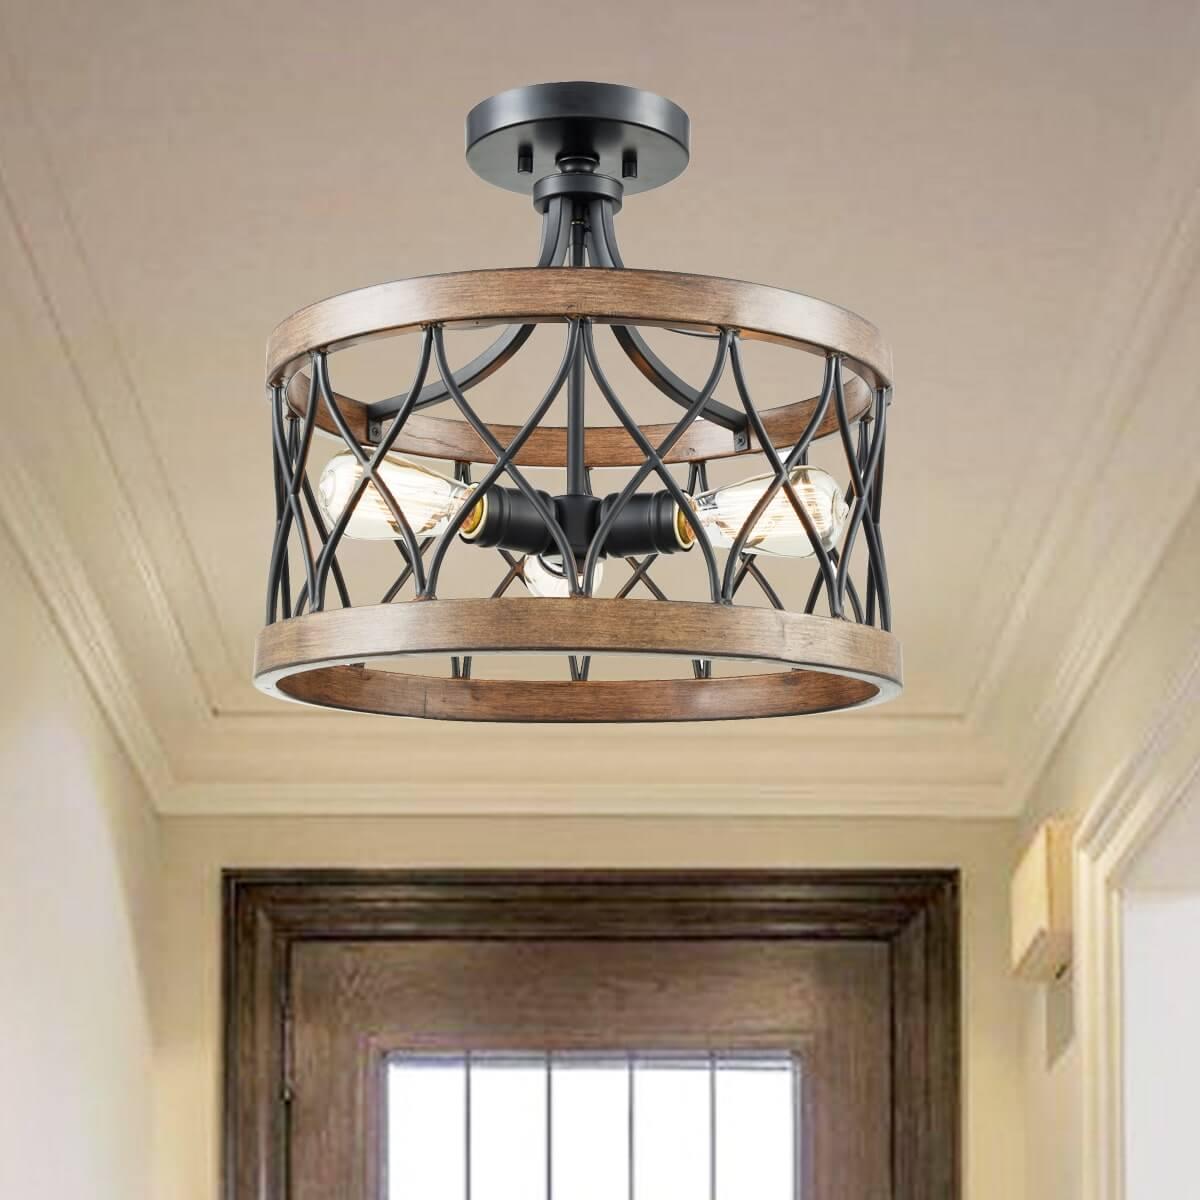 Retro Drum Wood Metal Cage Semi Flush Mount Ceiling Light 3 Lights